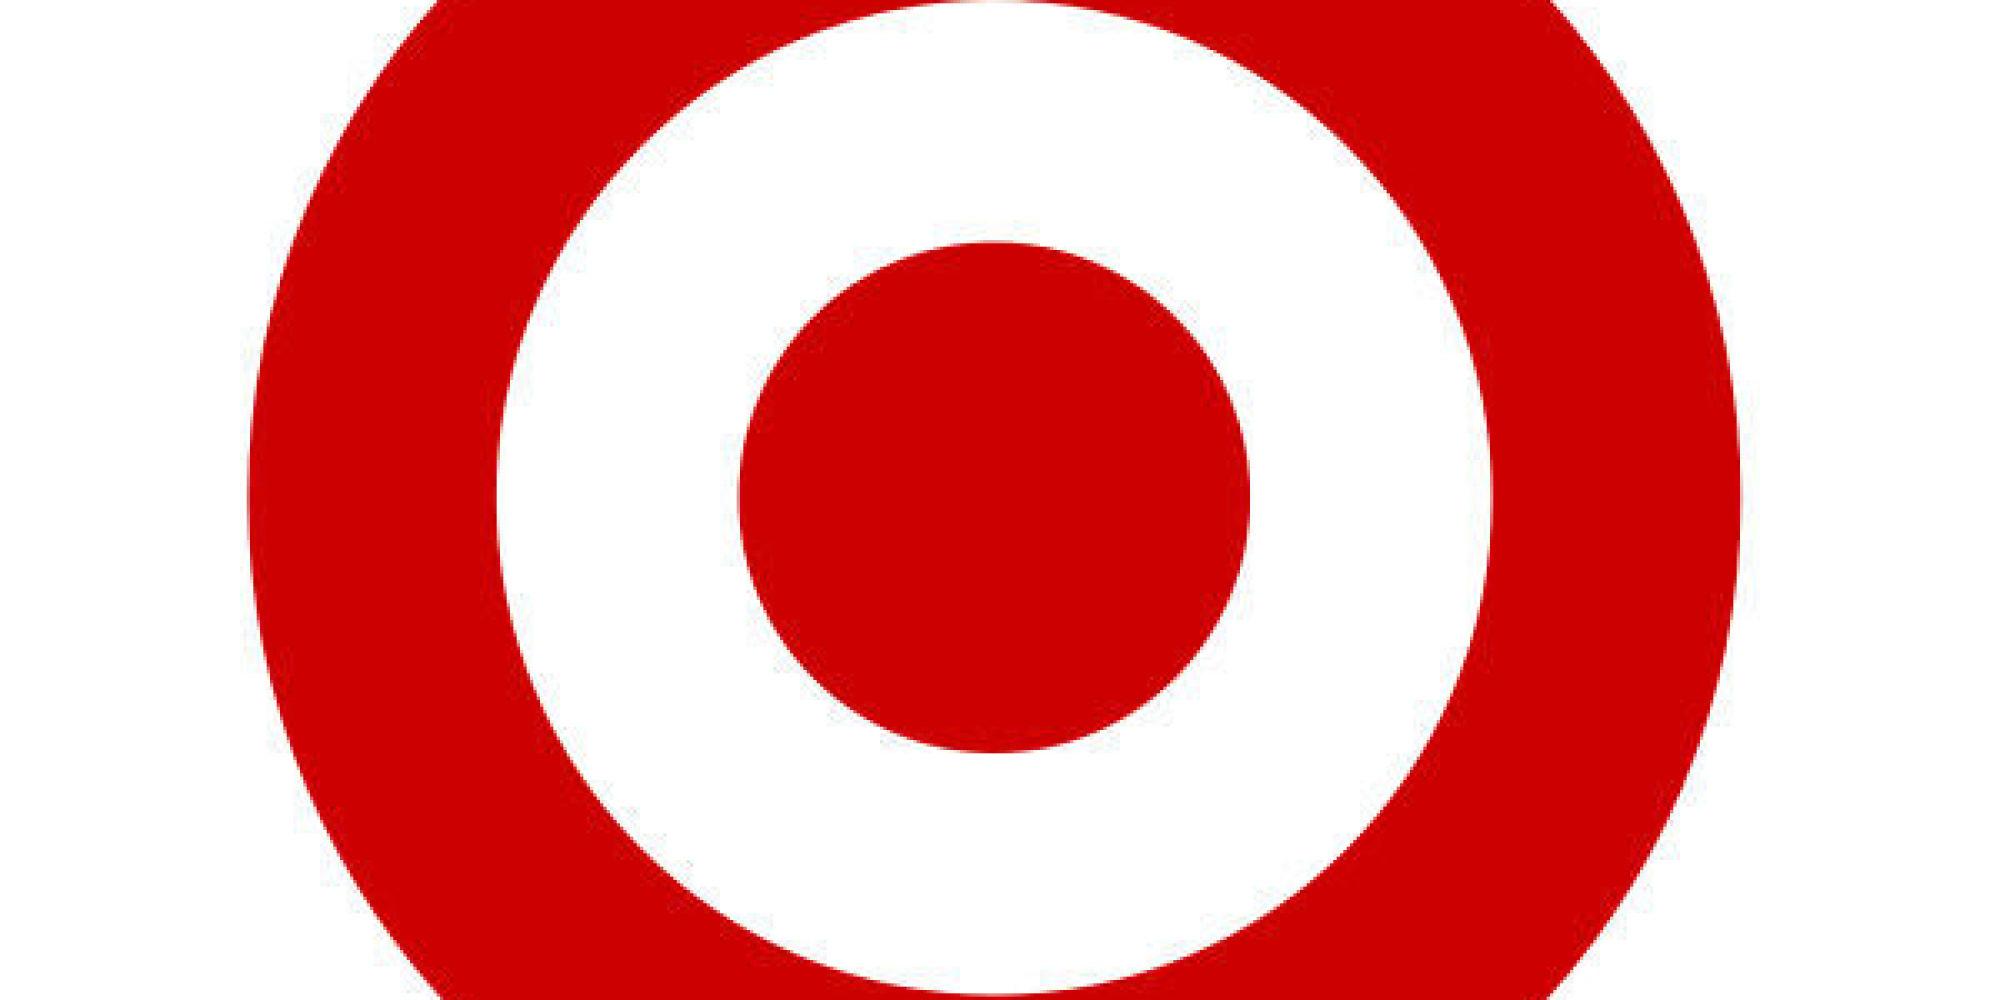 12 target logo vector images target bullseye logo target bullseye rh newdesignfile com  target logo vector free download